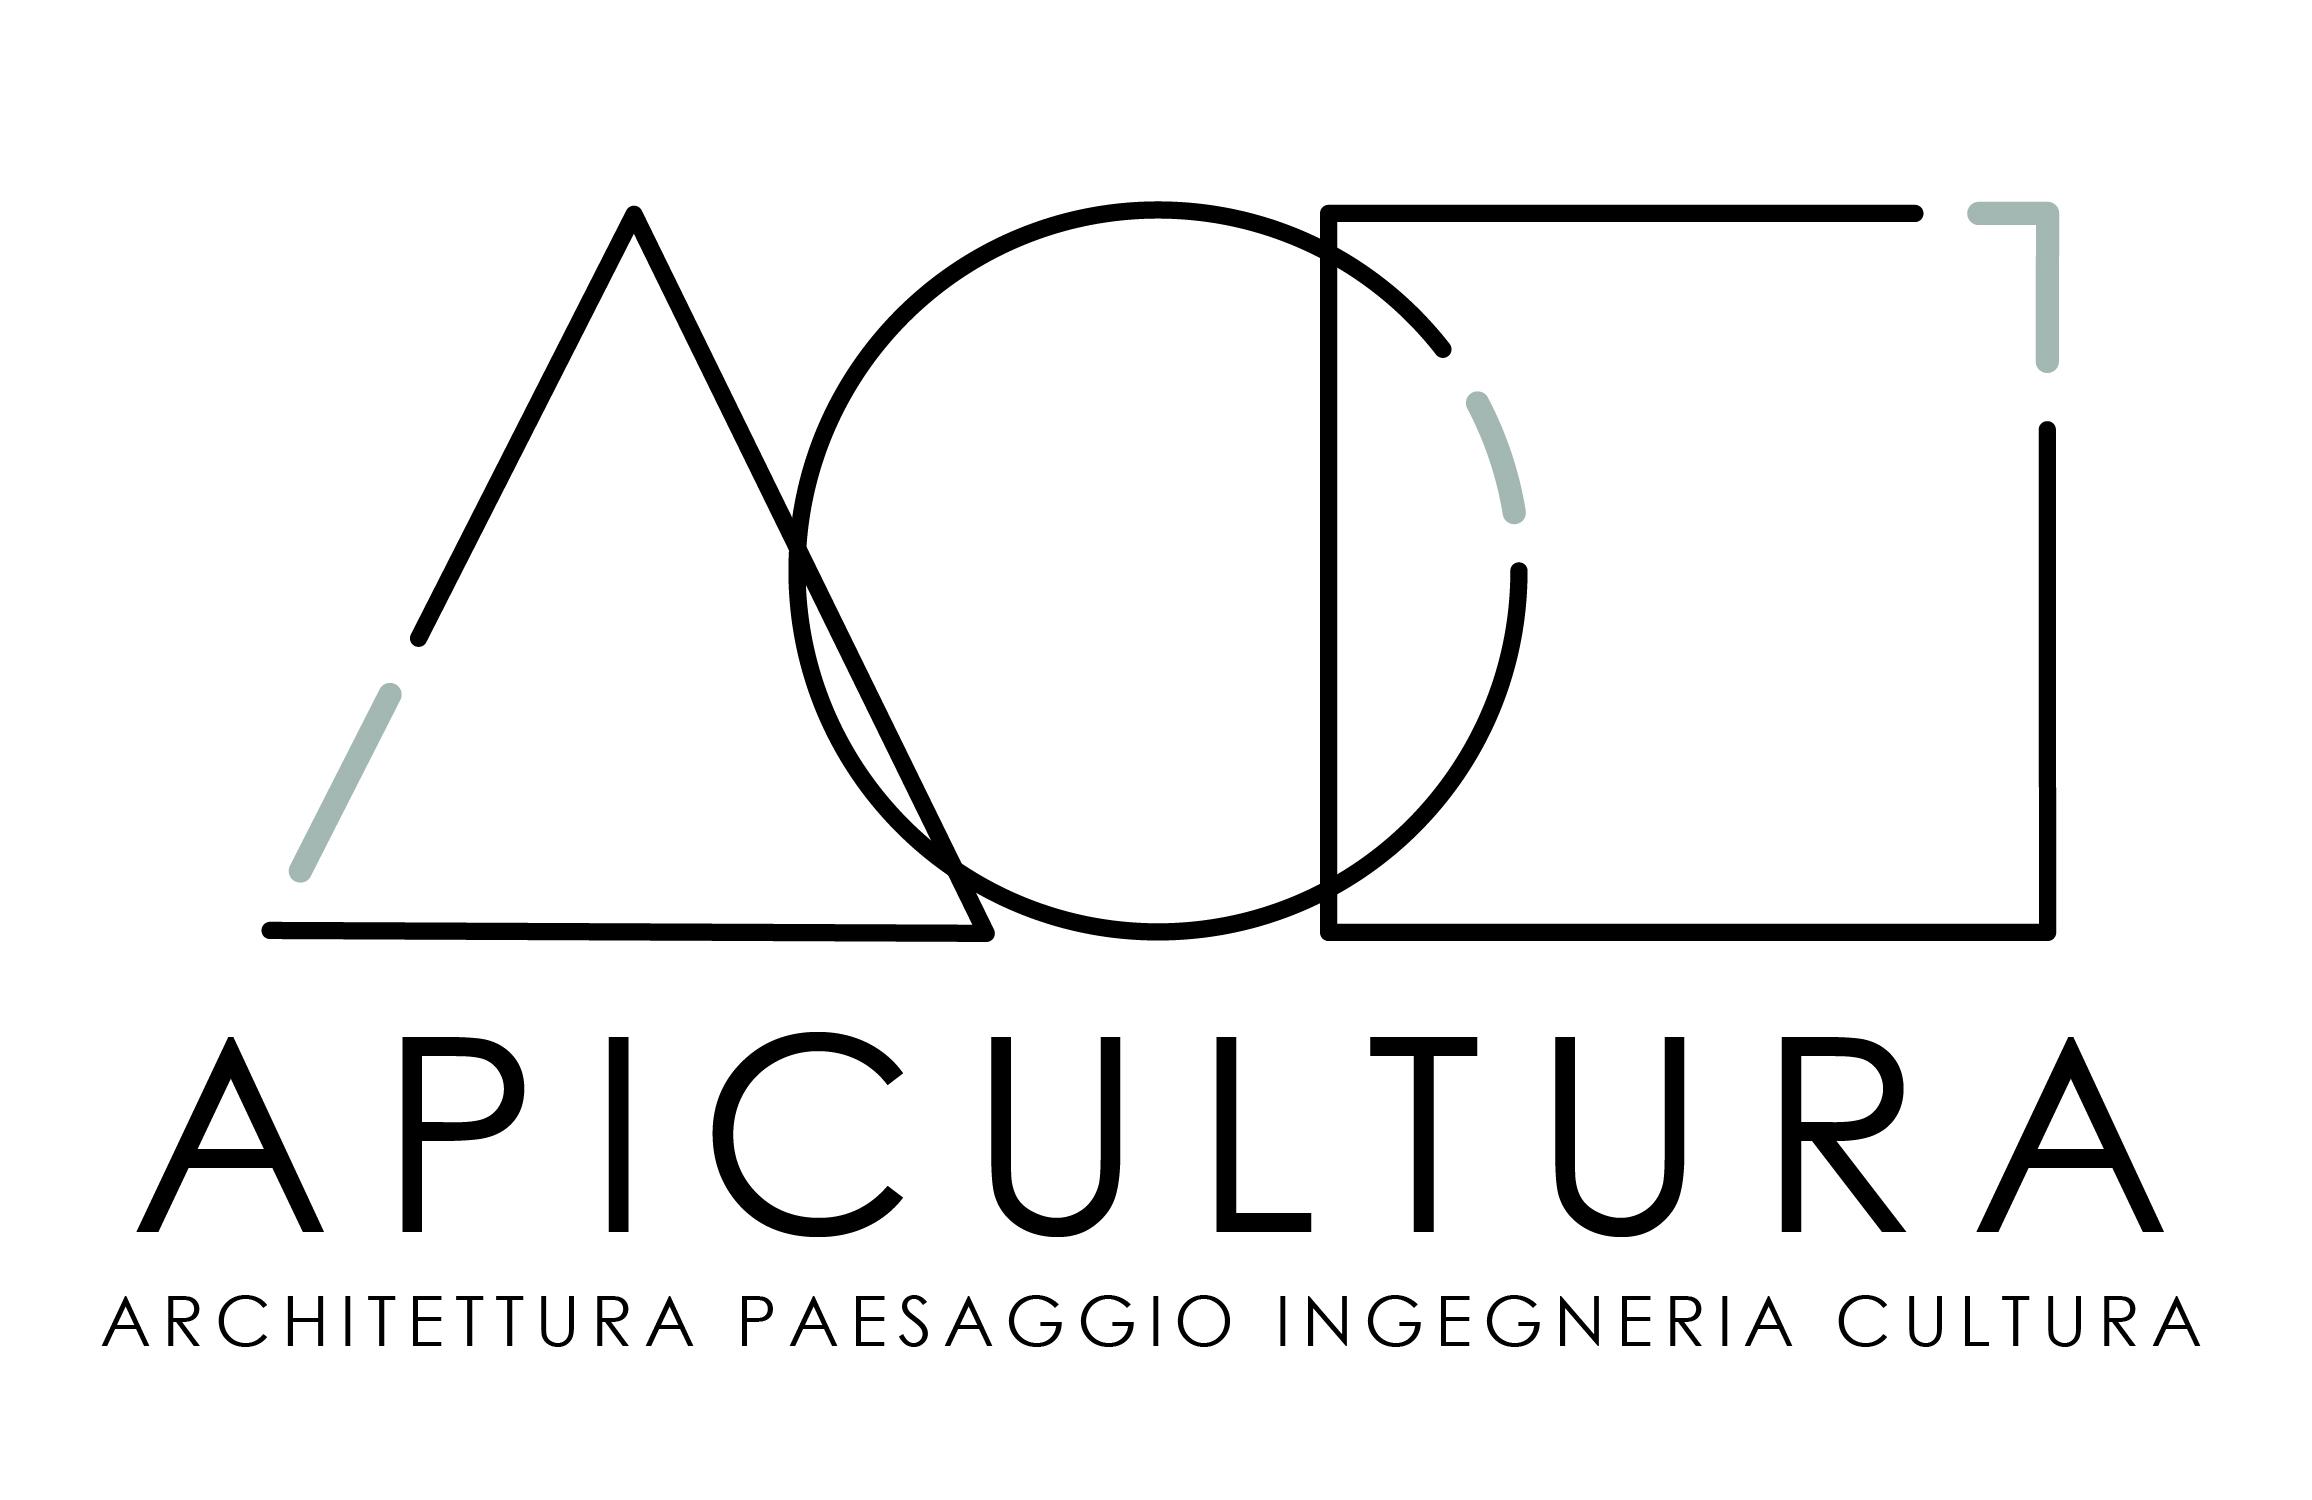 Studio Architettura Paesaggio Milano apicultura – architettura paesaggio ingegneria